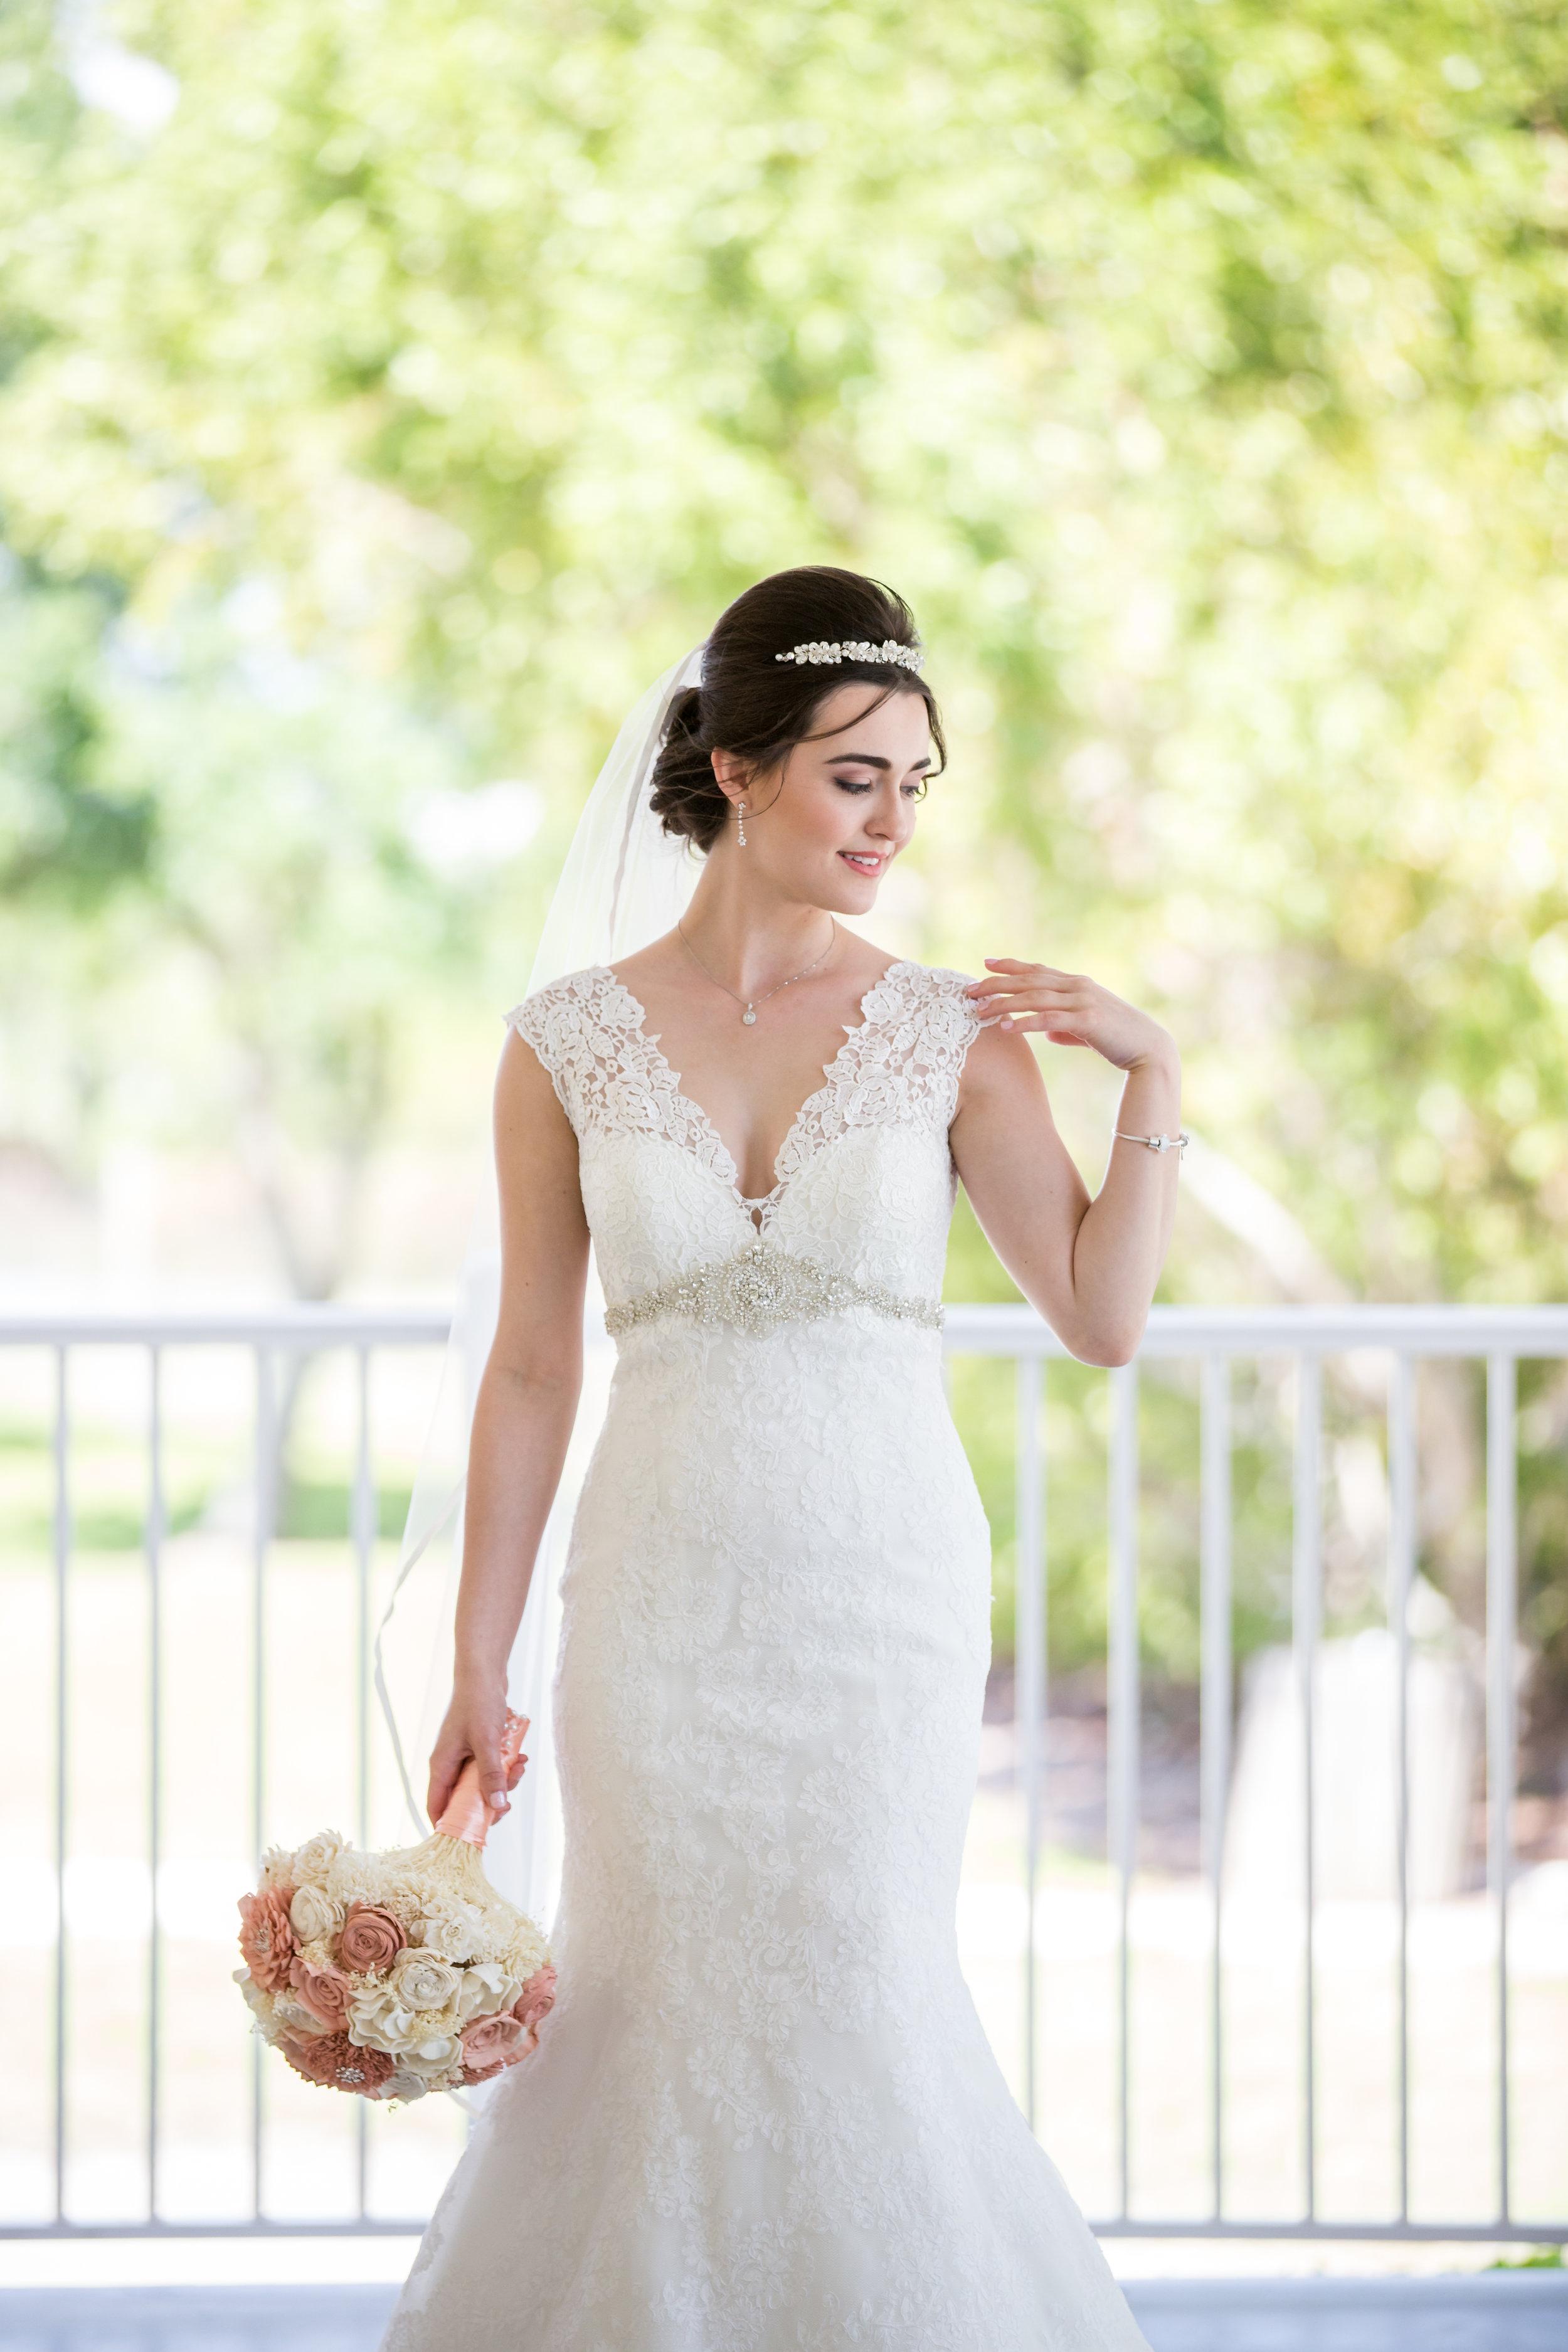 wedding hair and makeup artist airbrush lashes